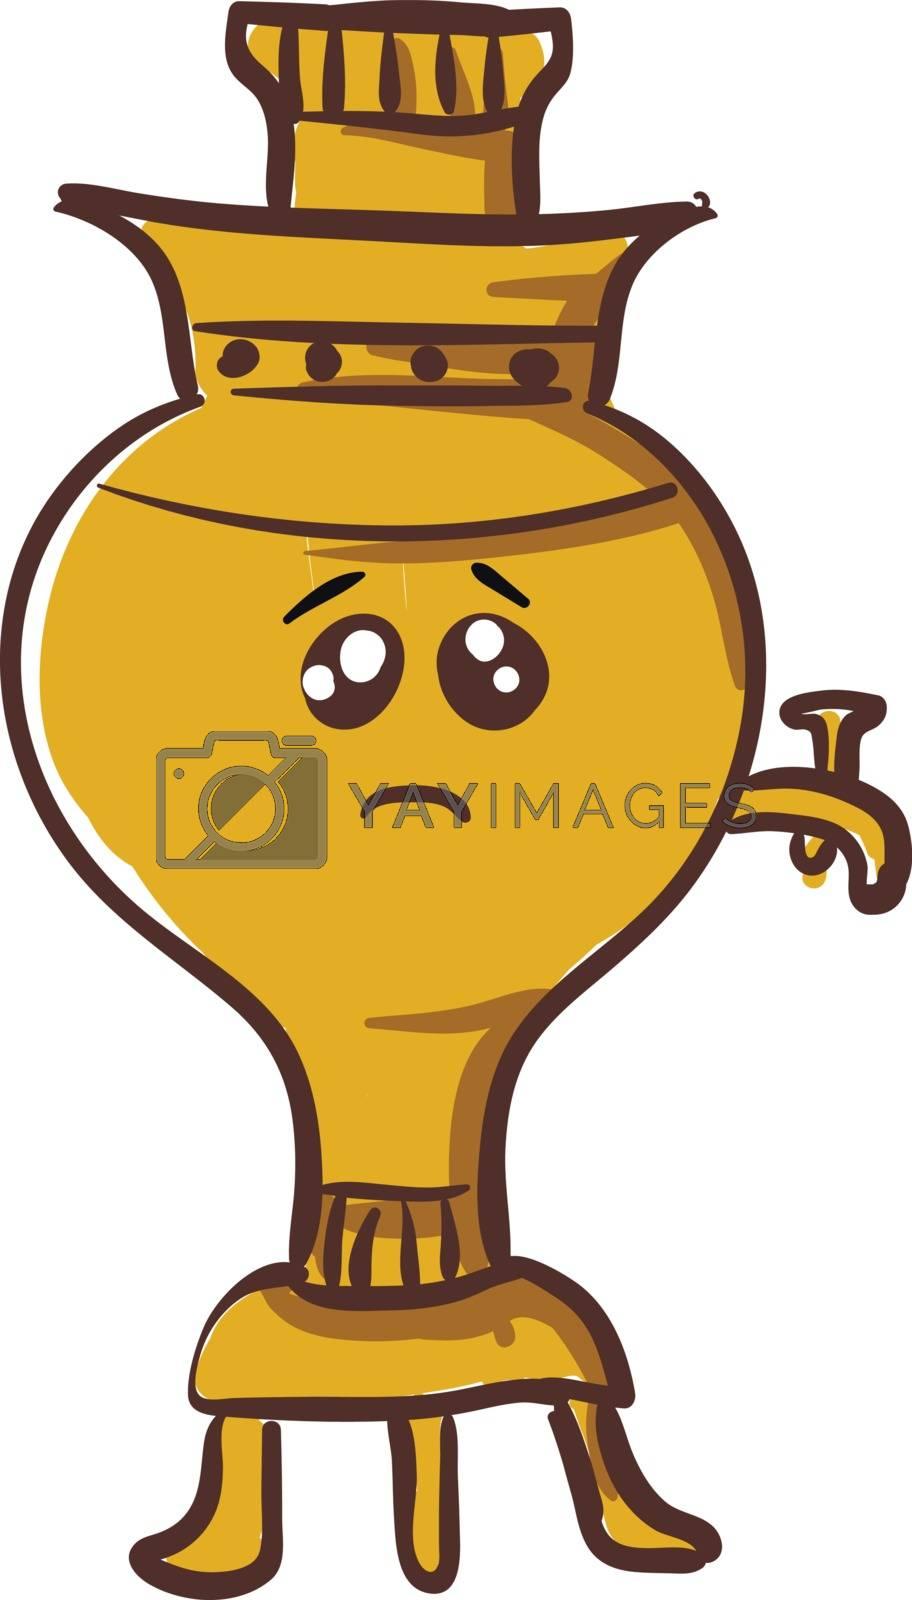 Royalty free image of Emoji of a sad samovar vector or color illustration by Morphart